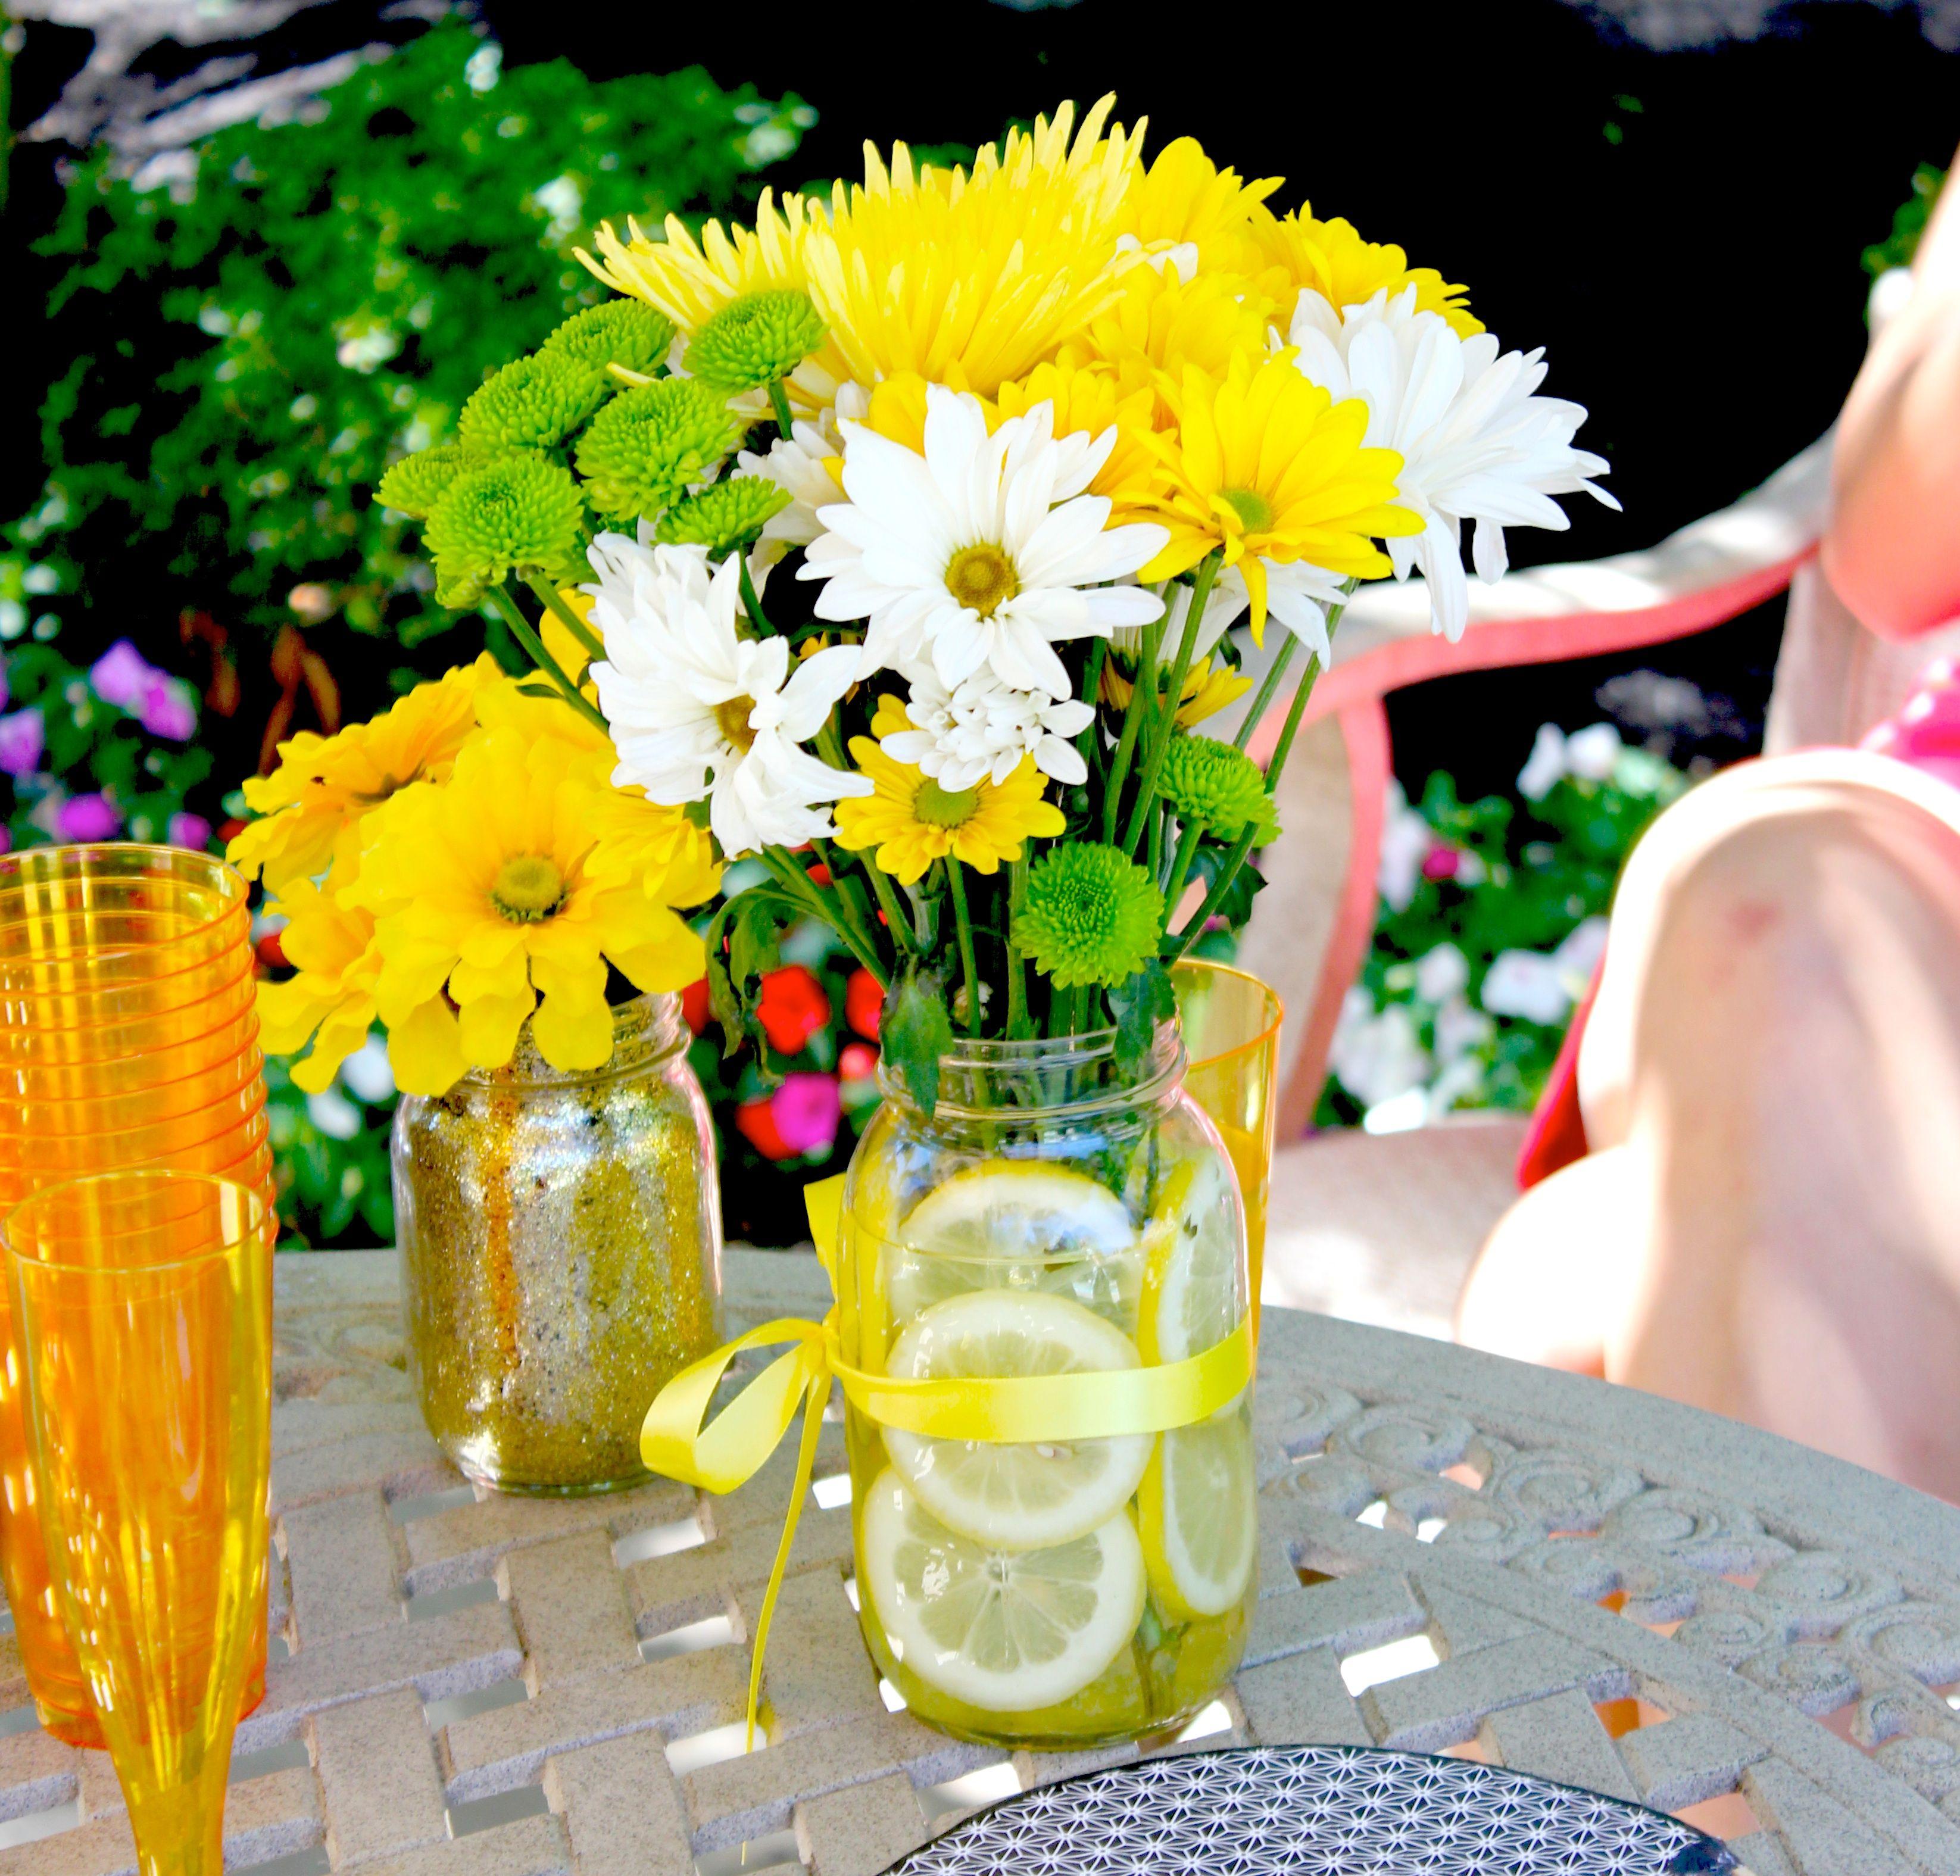 Flowers In Jars Wedding: Flower Centerpiece Using Mason Jar And Lemon Slices